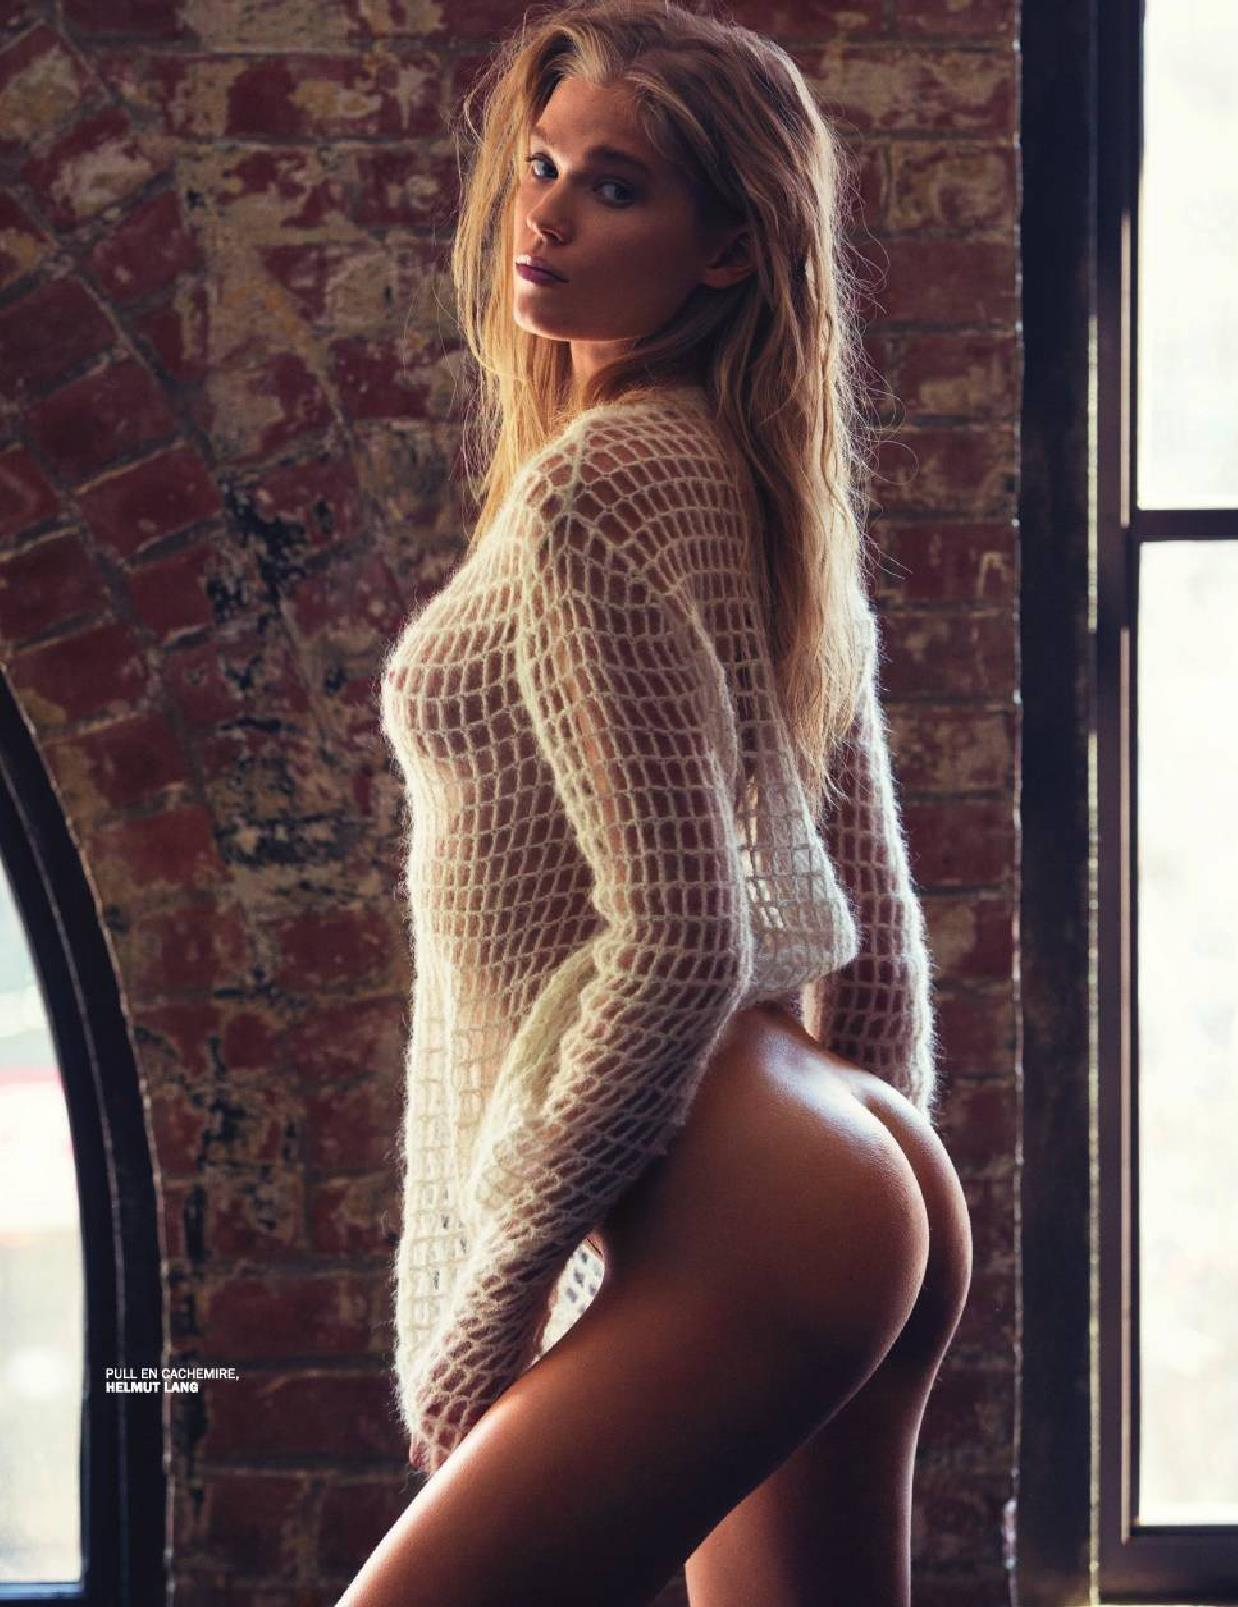 Вита Сидоркина (Vita Sidorkina) Фото - модель из России / Страница - 15